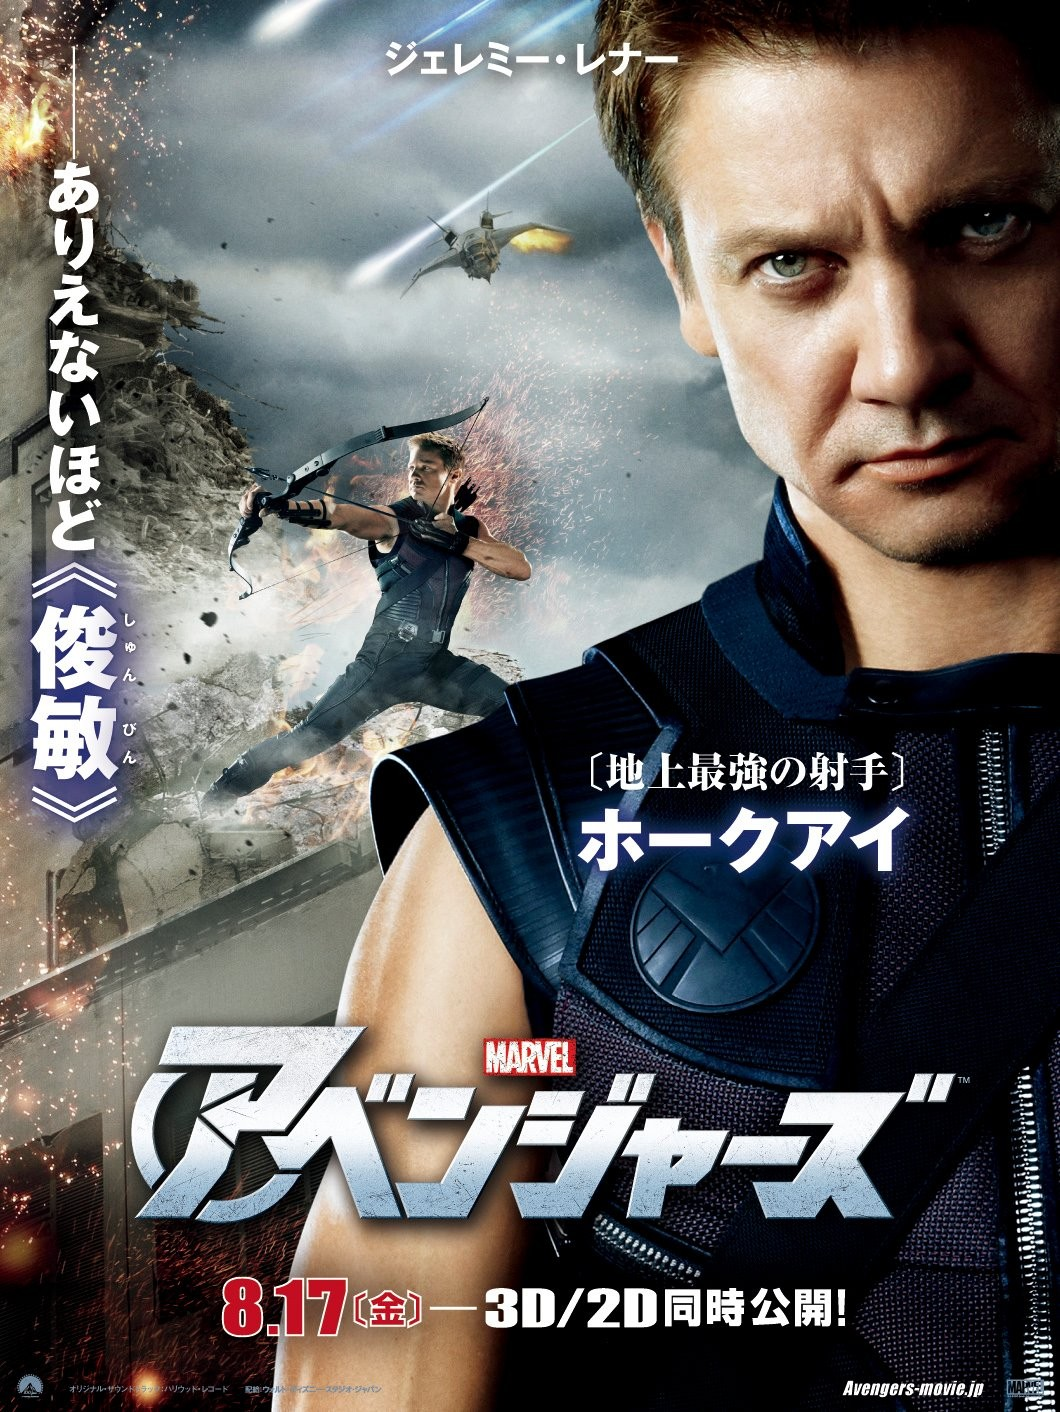 The Avengers - Hawkeye poster - Japan